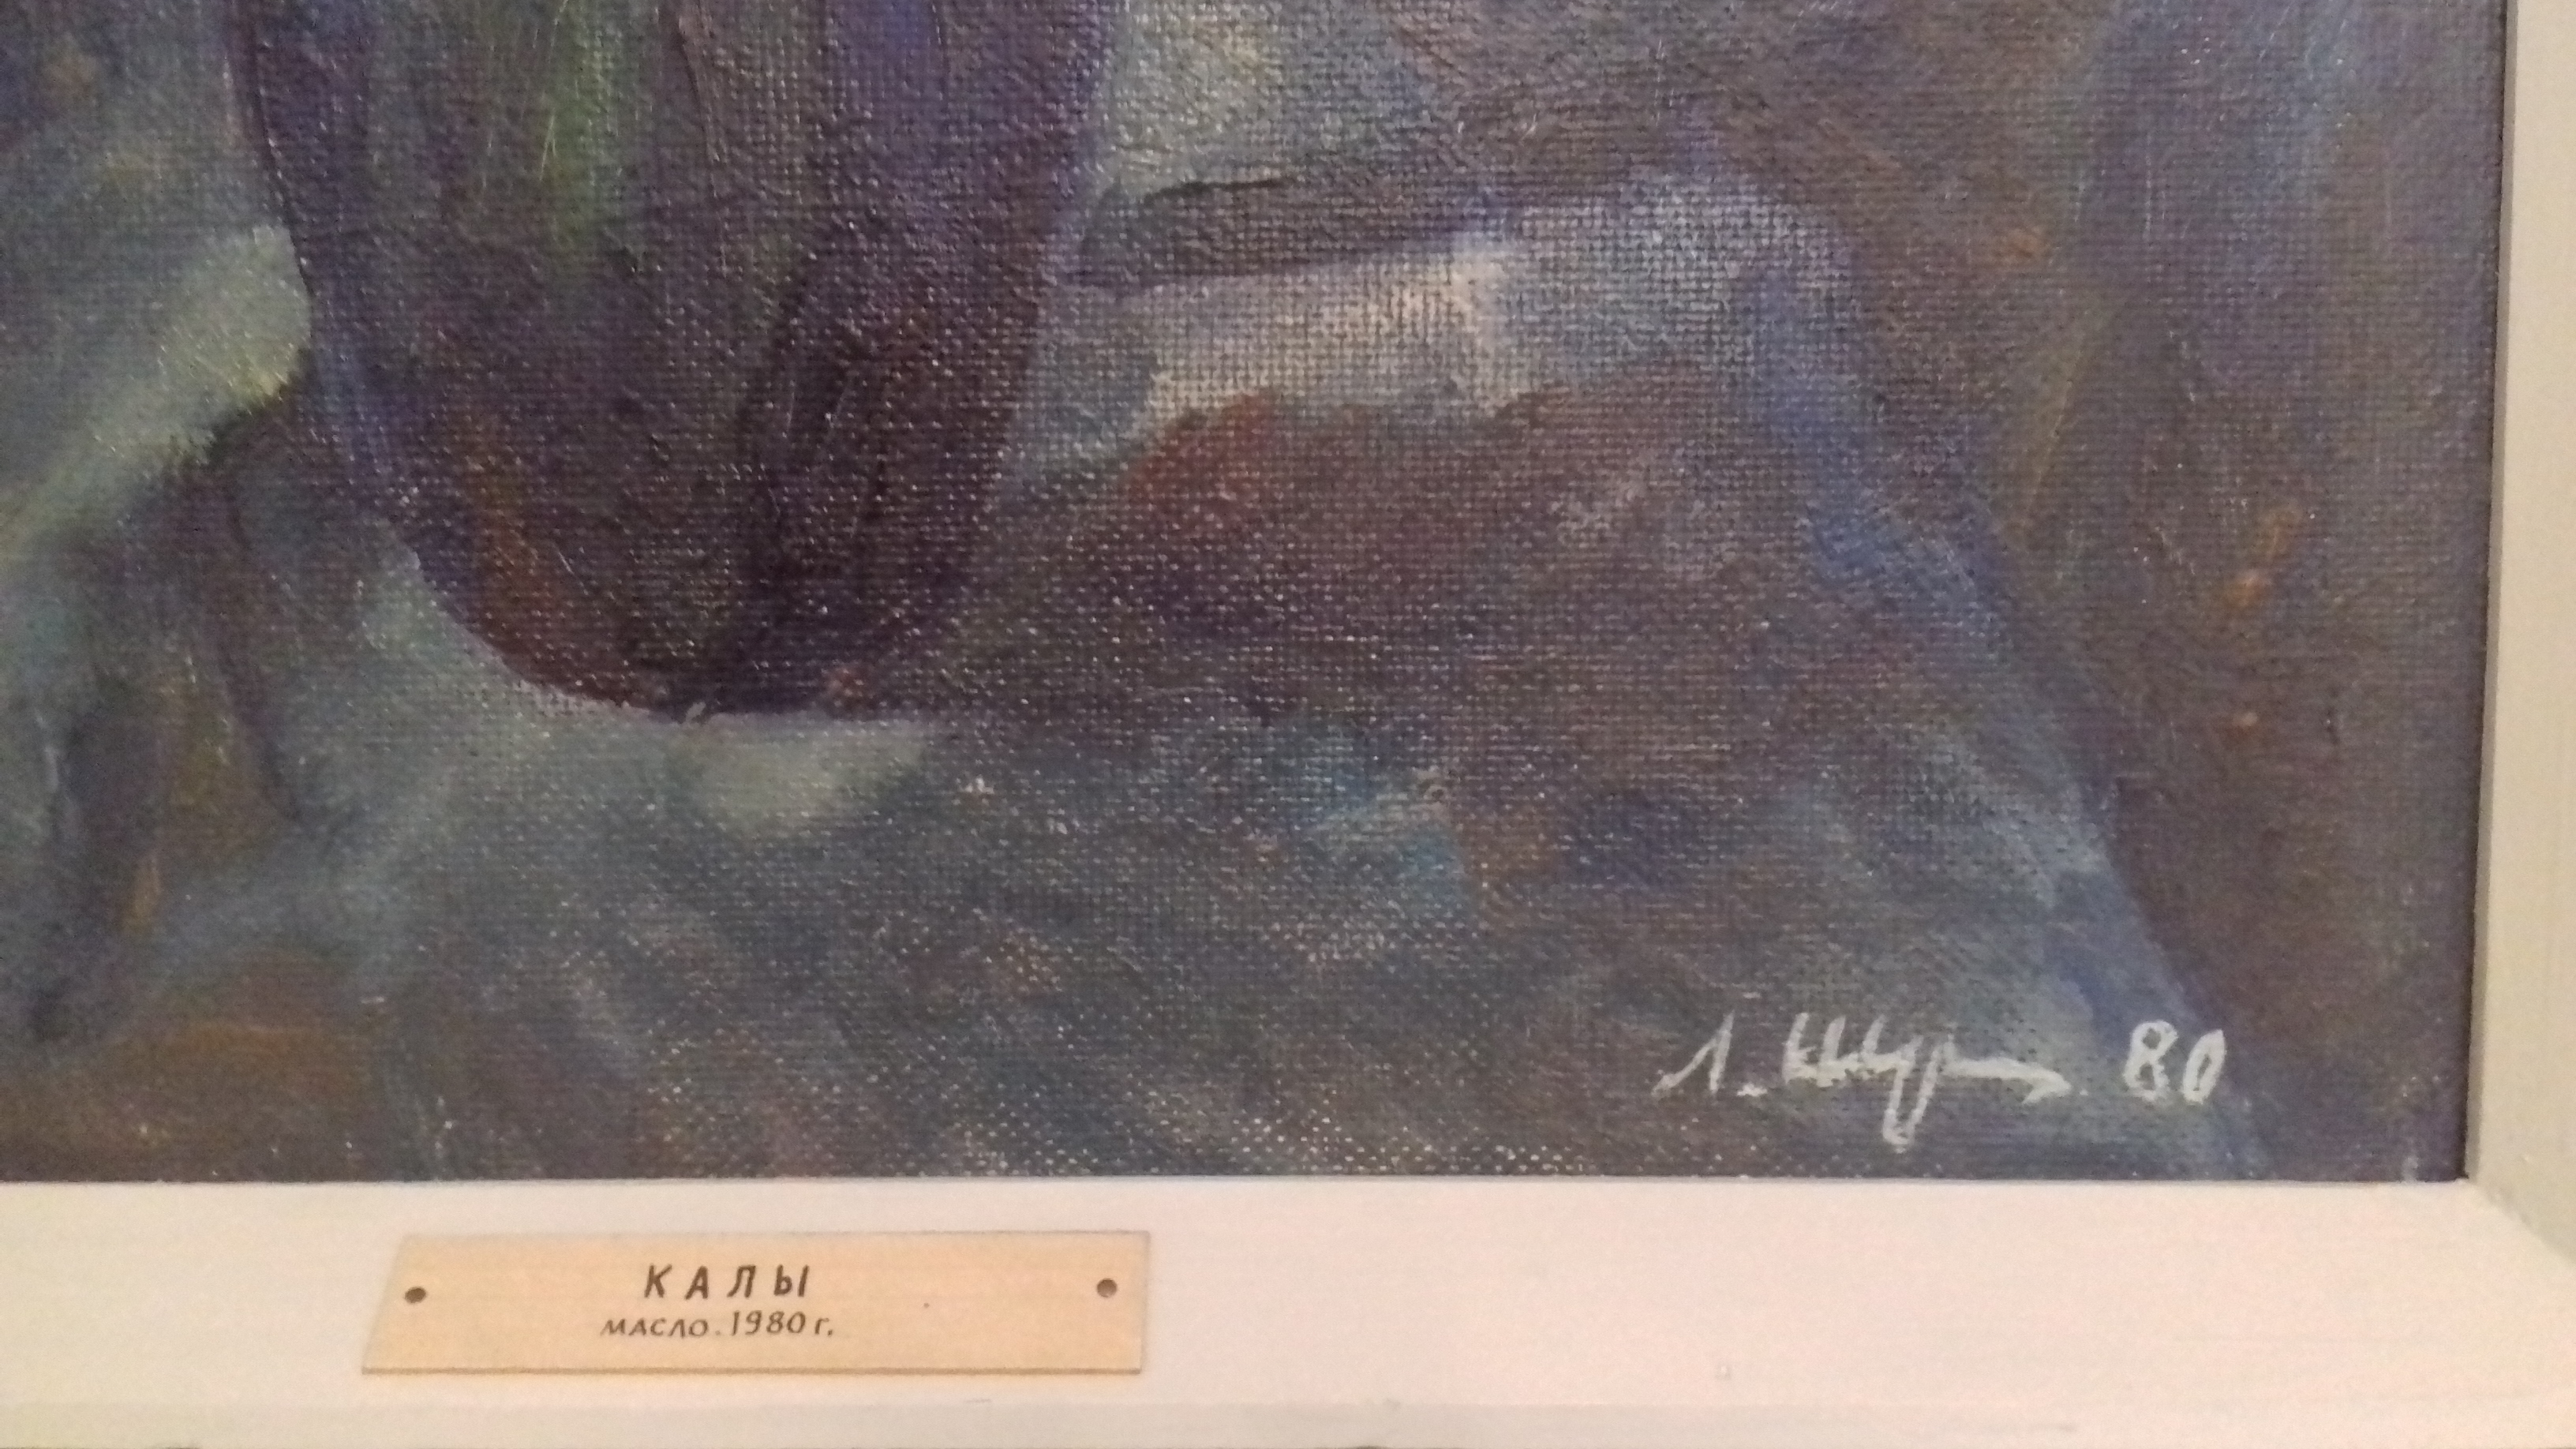 Калы 77-50 см. картон, масло 1980  - 2